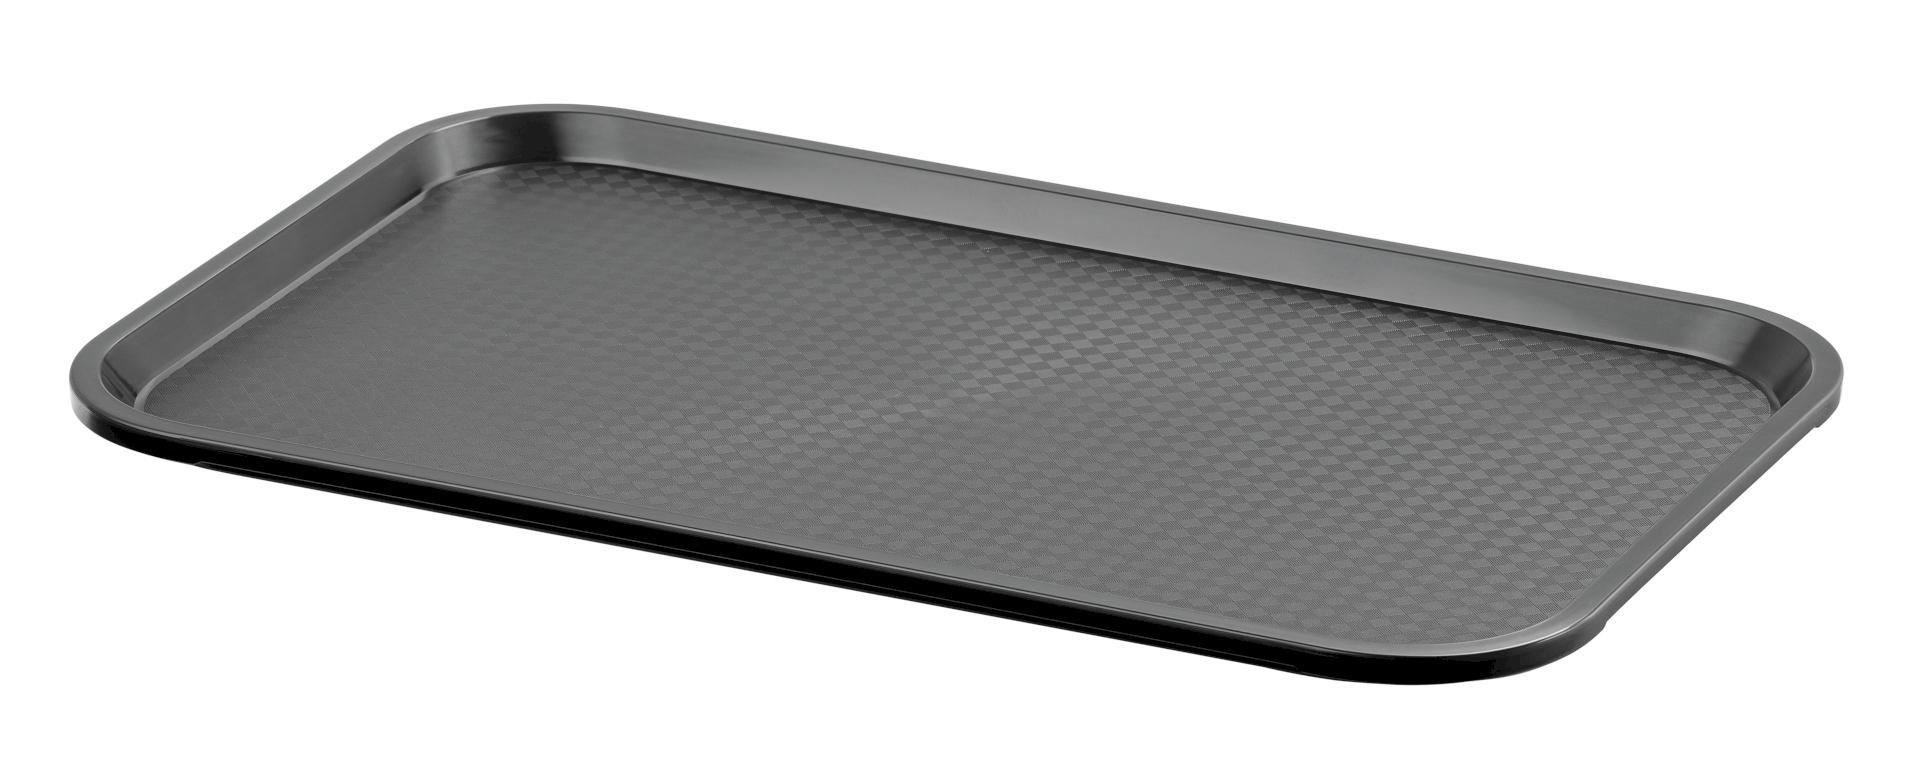 Bartscher Tablett GN110-S